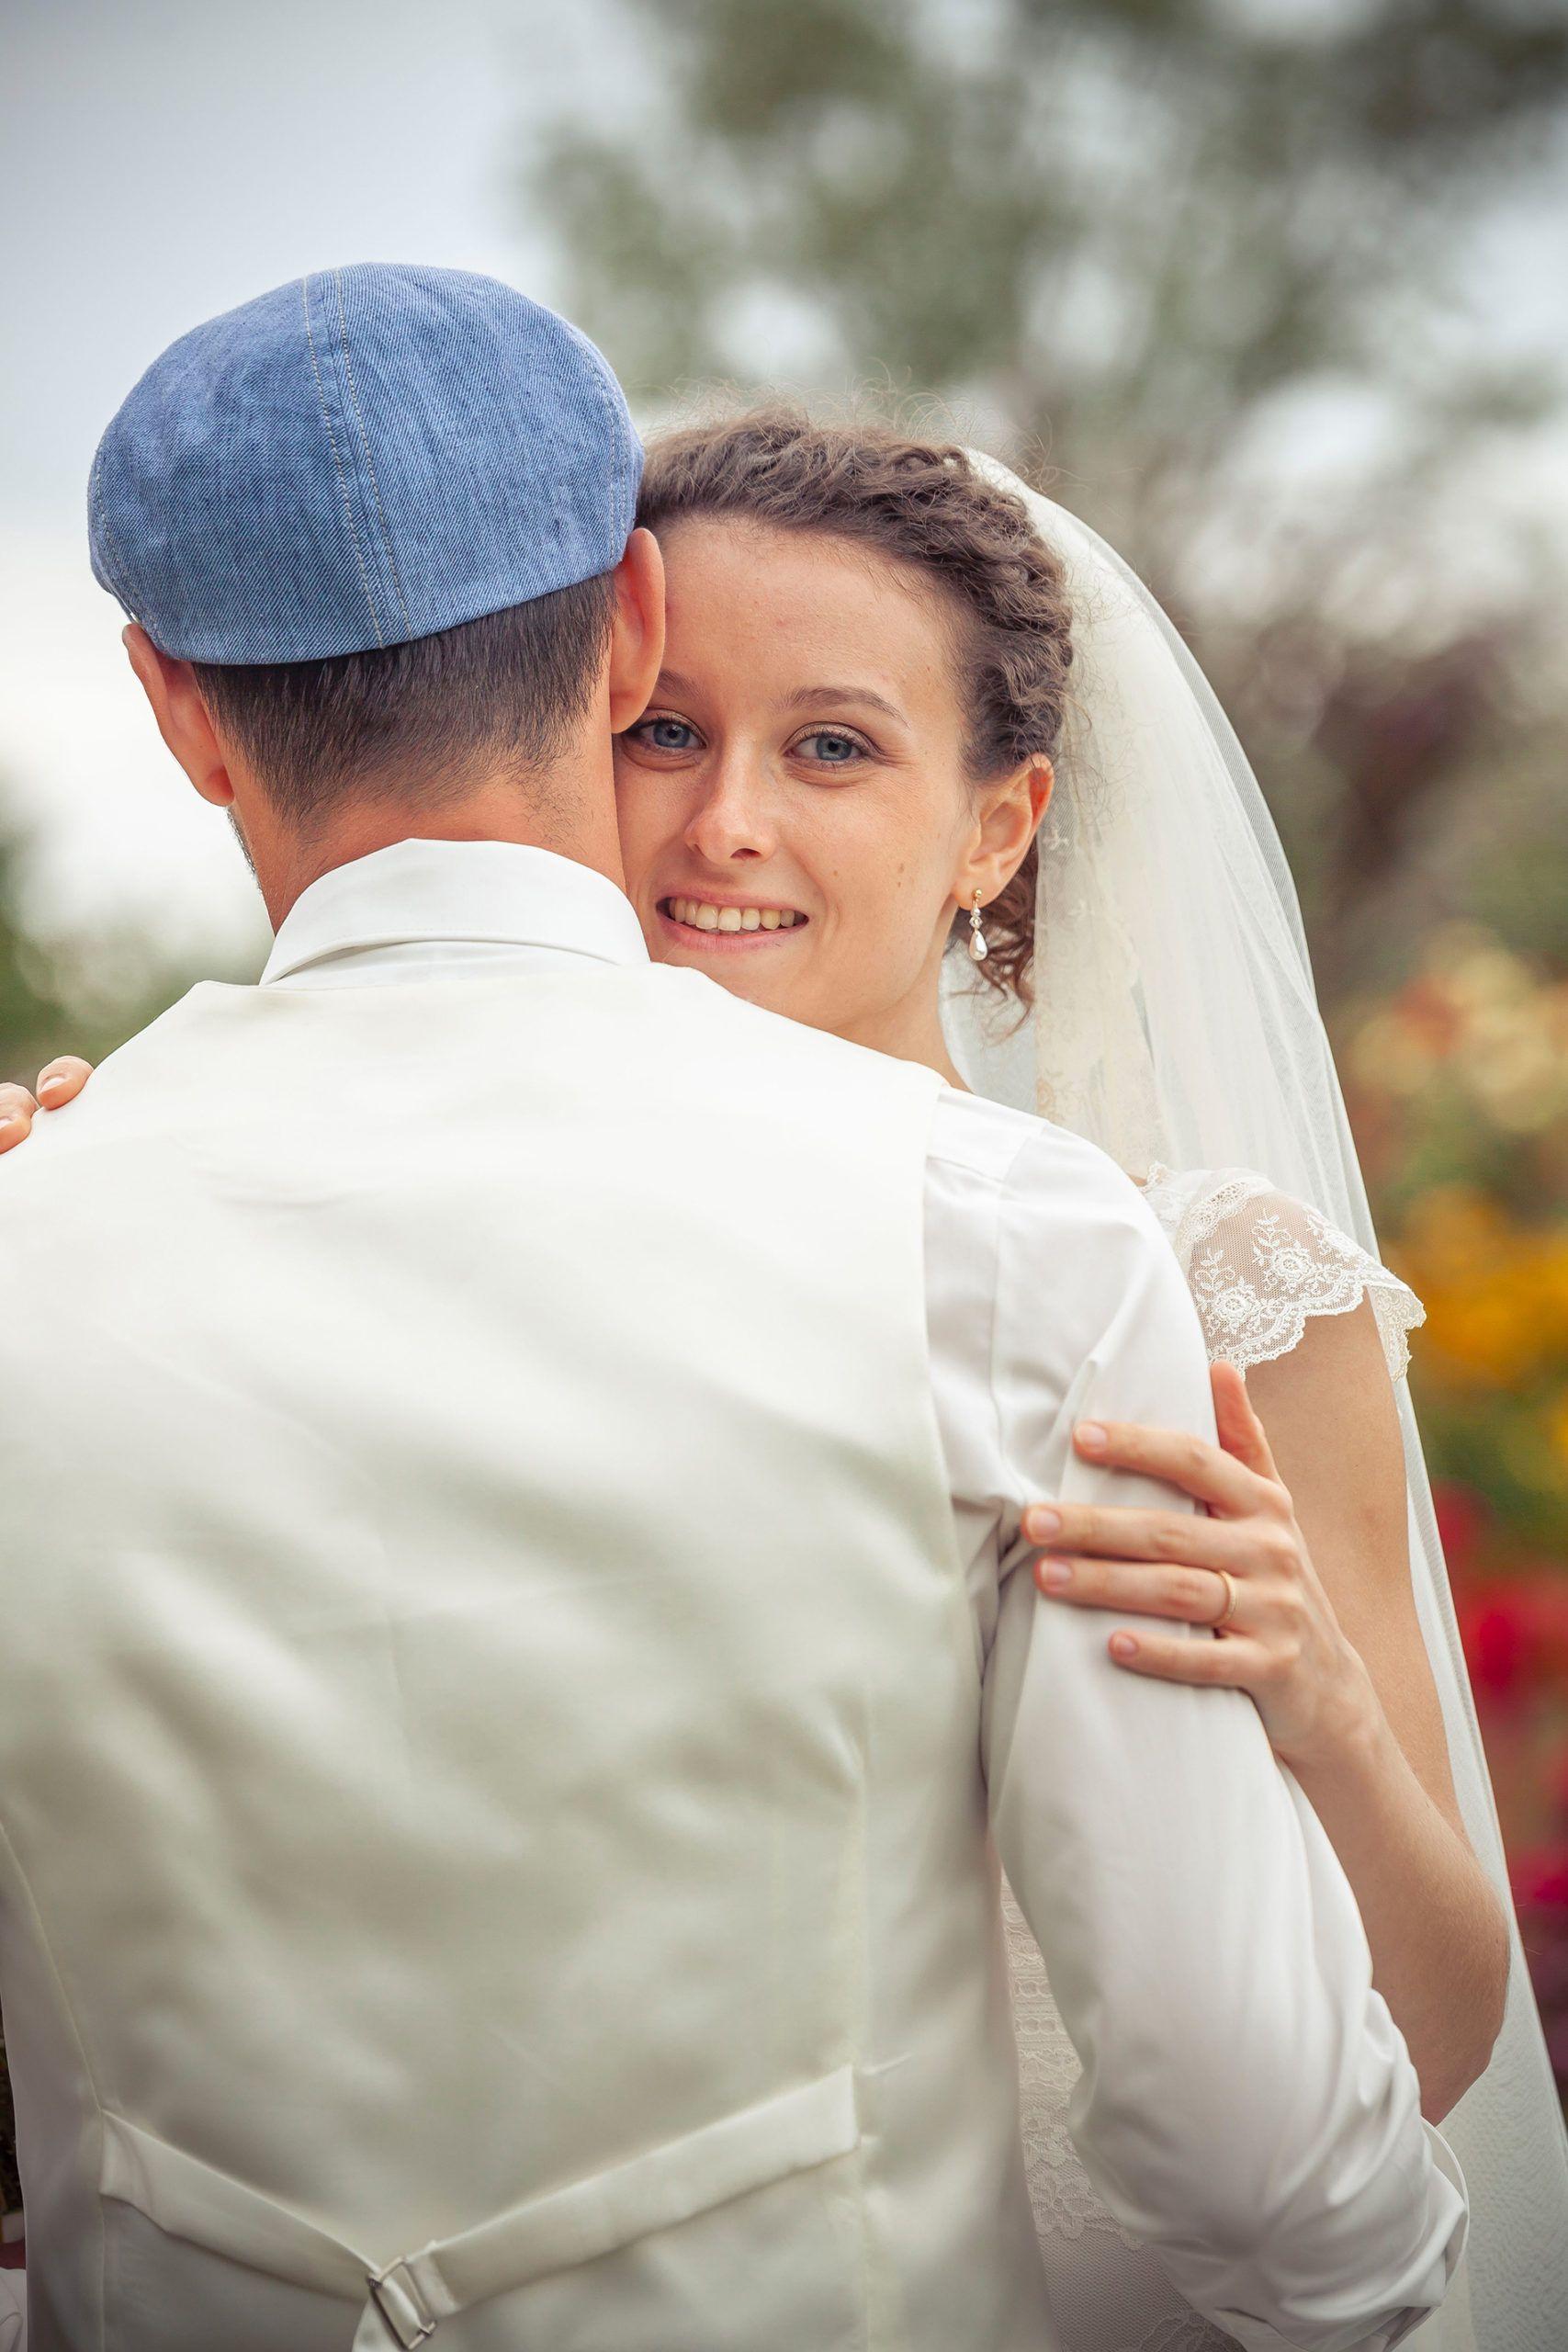 Photographie Vienne mariée heureuse